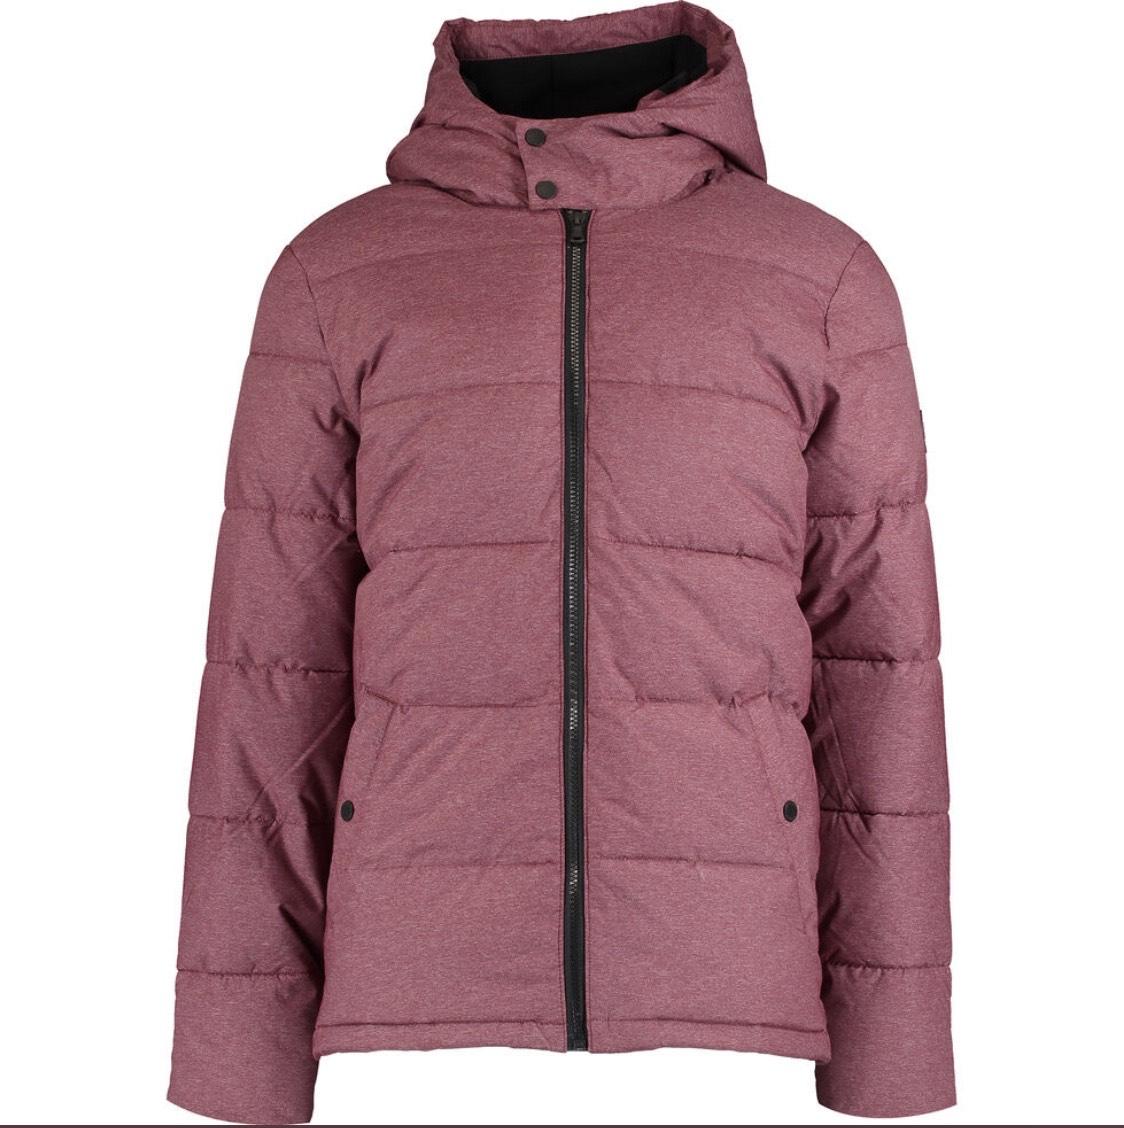 ORIGINAL PENGUIN Purple Heather Padded Jacket £51.98 delivered at TK Maxx